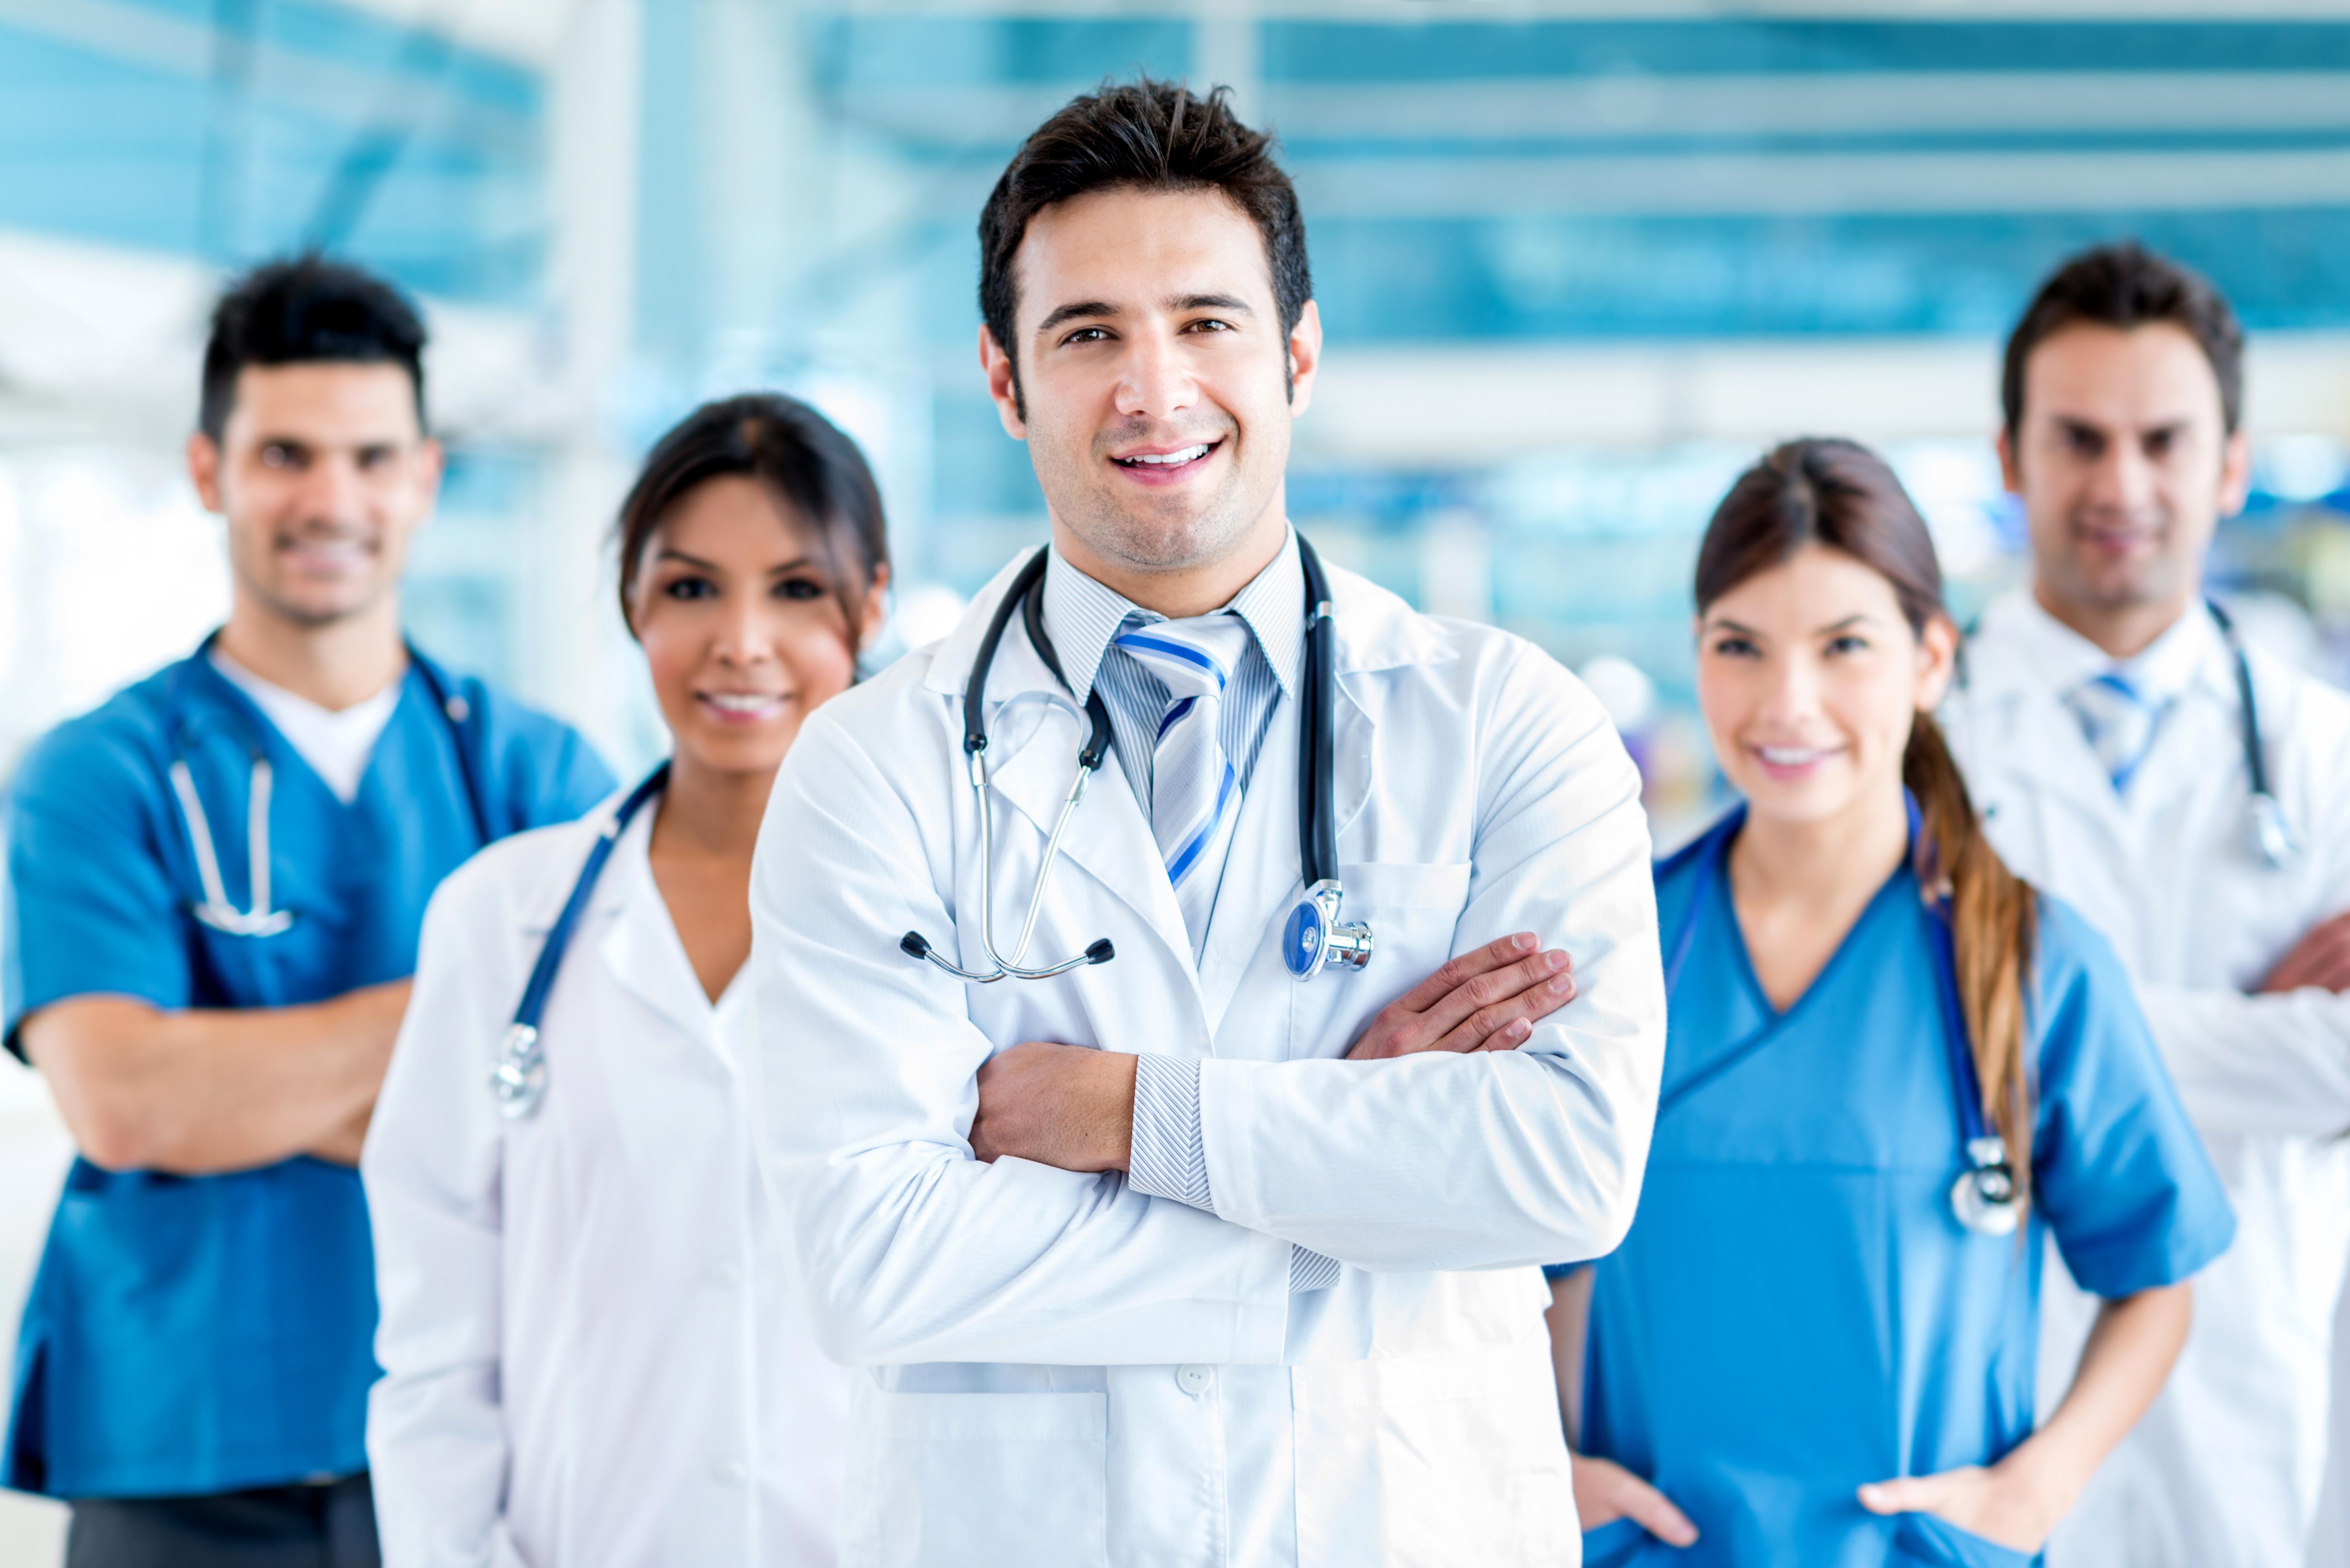 Покриття витрат платної медичної допомоги